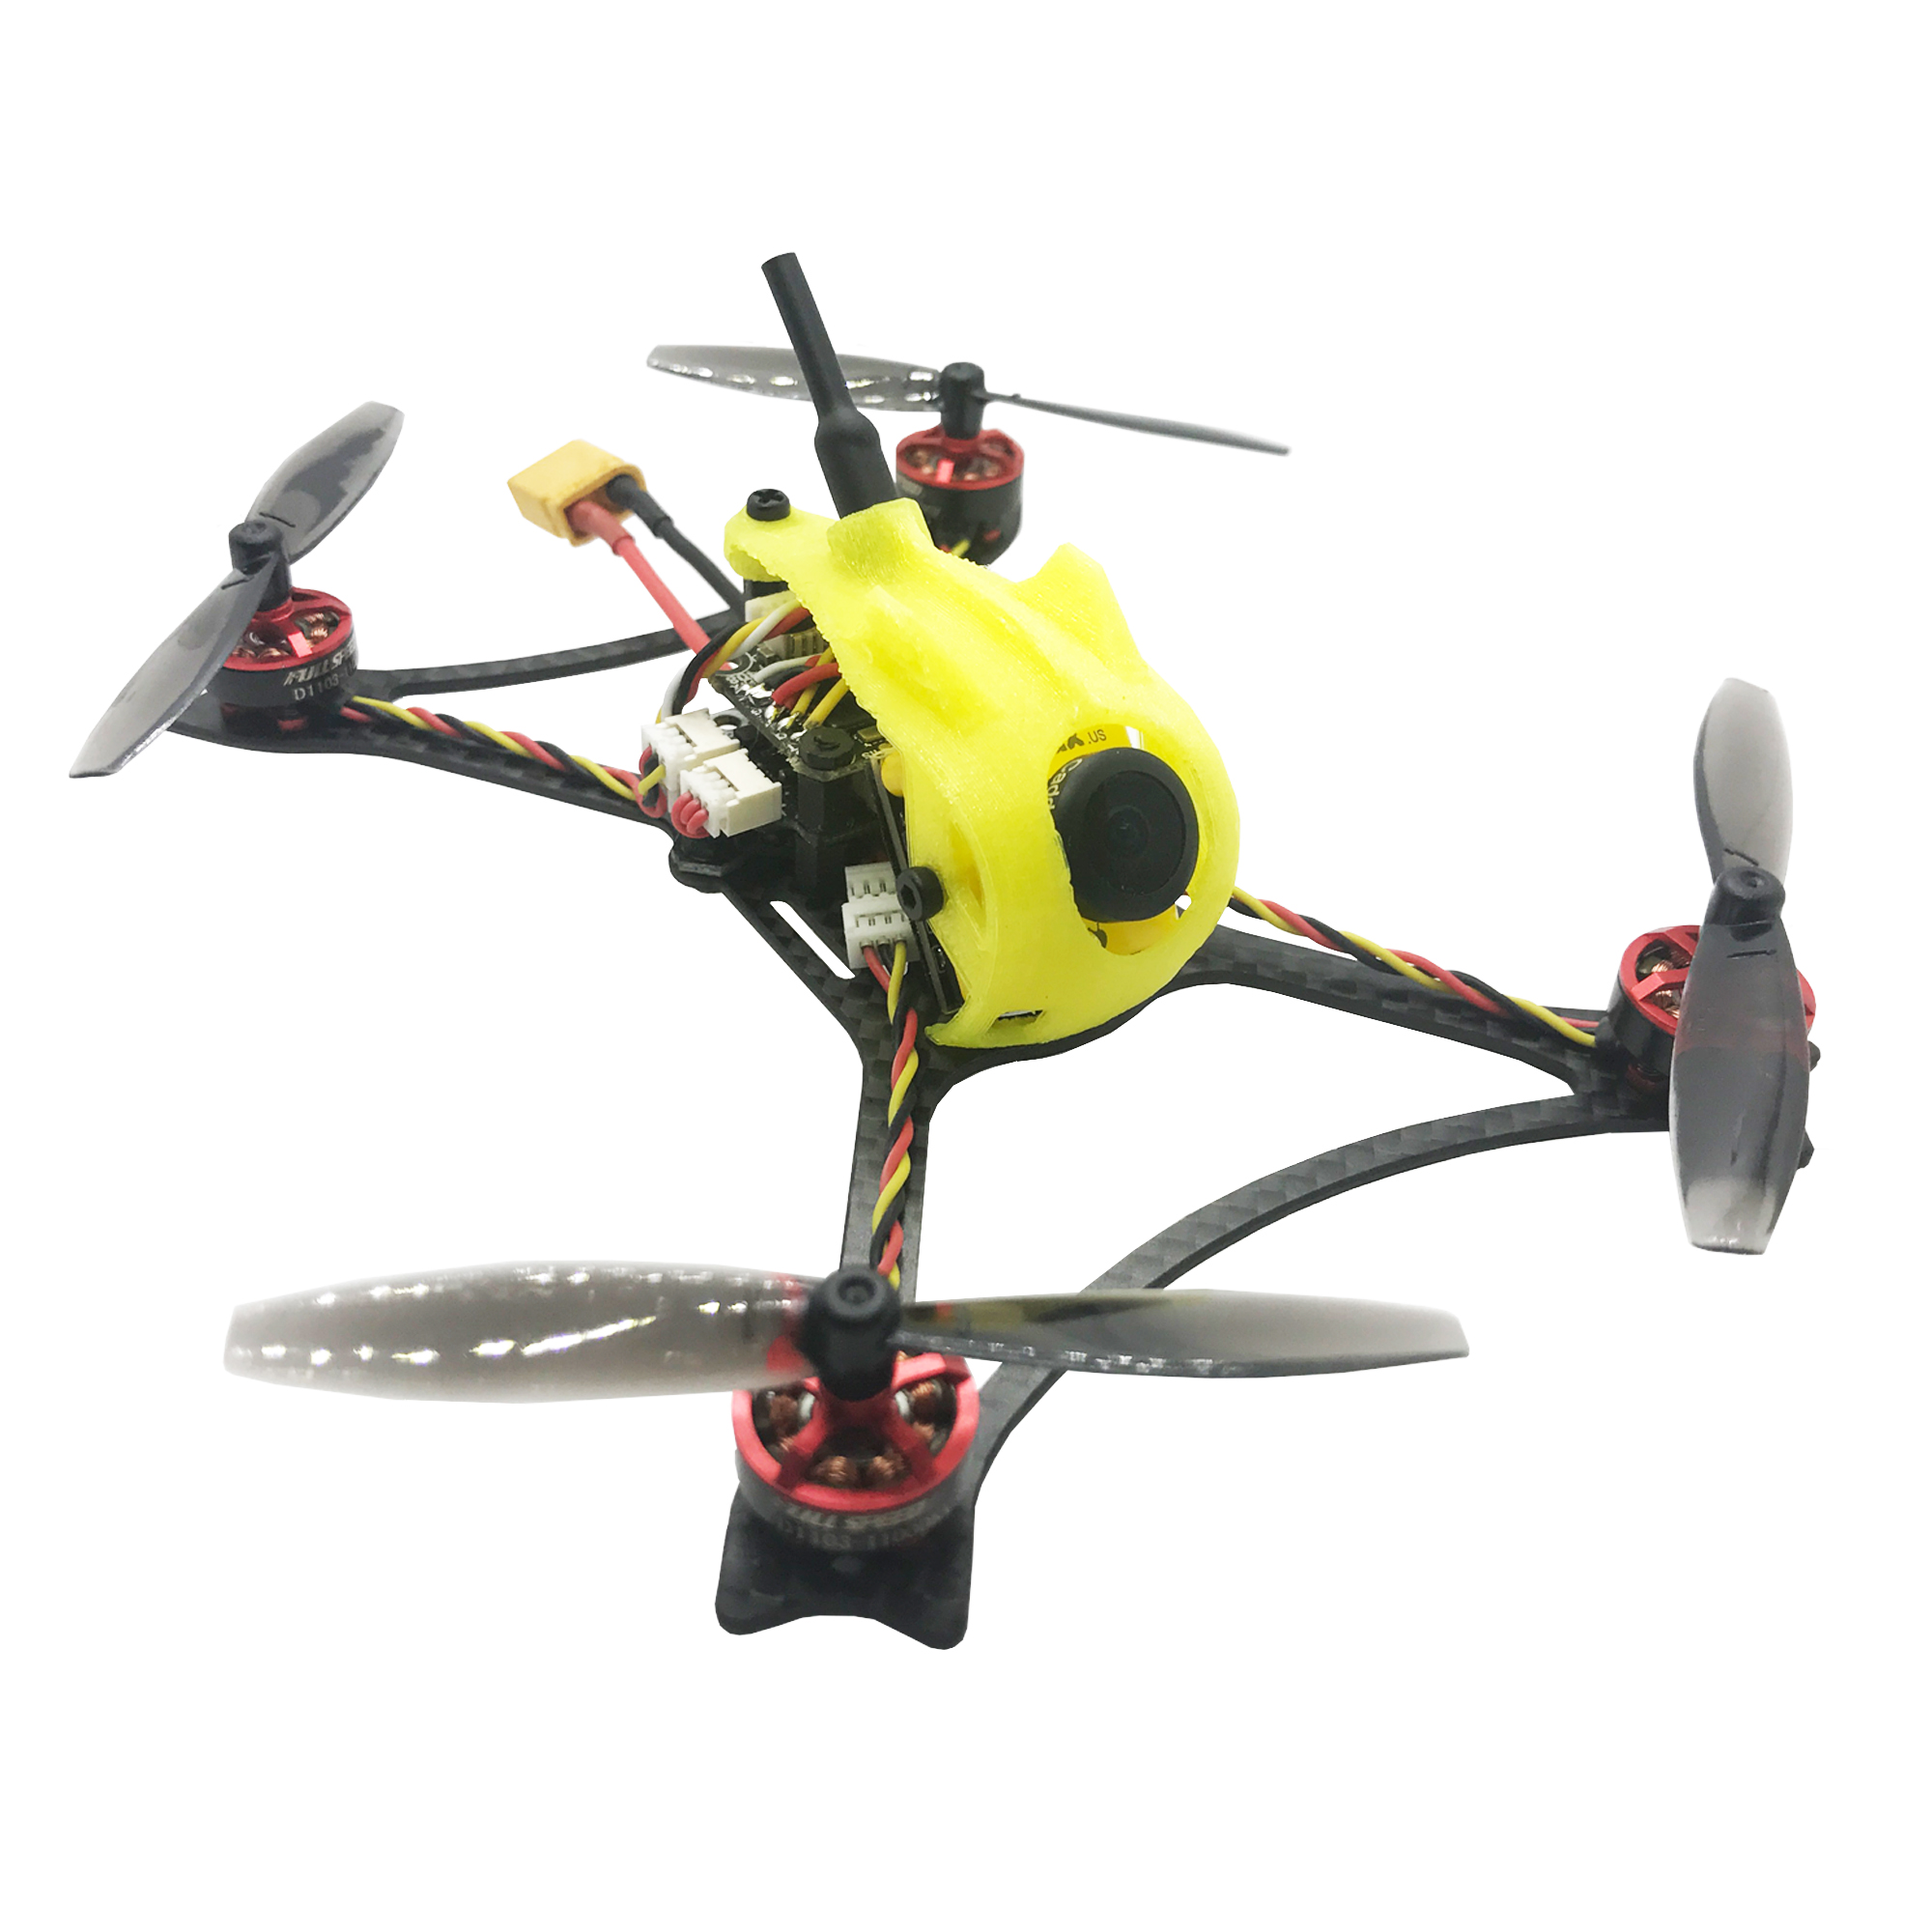 FullSpeed Toothpick FPV Racing Drone 2 3S 1103 65mm prop 25 600mw VTX